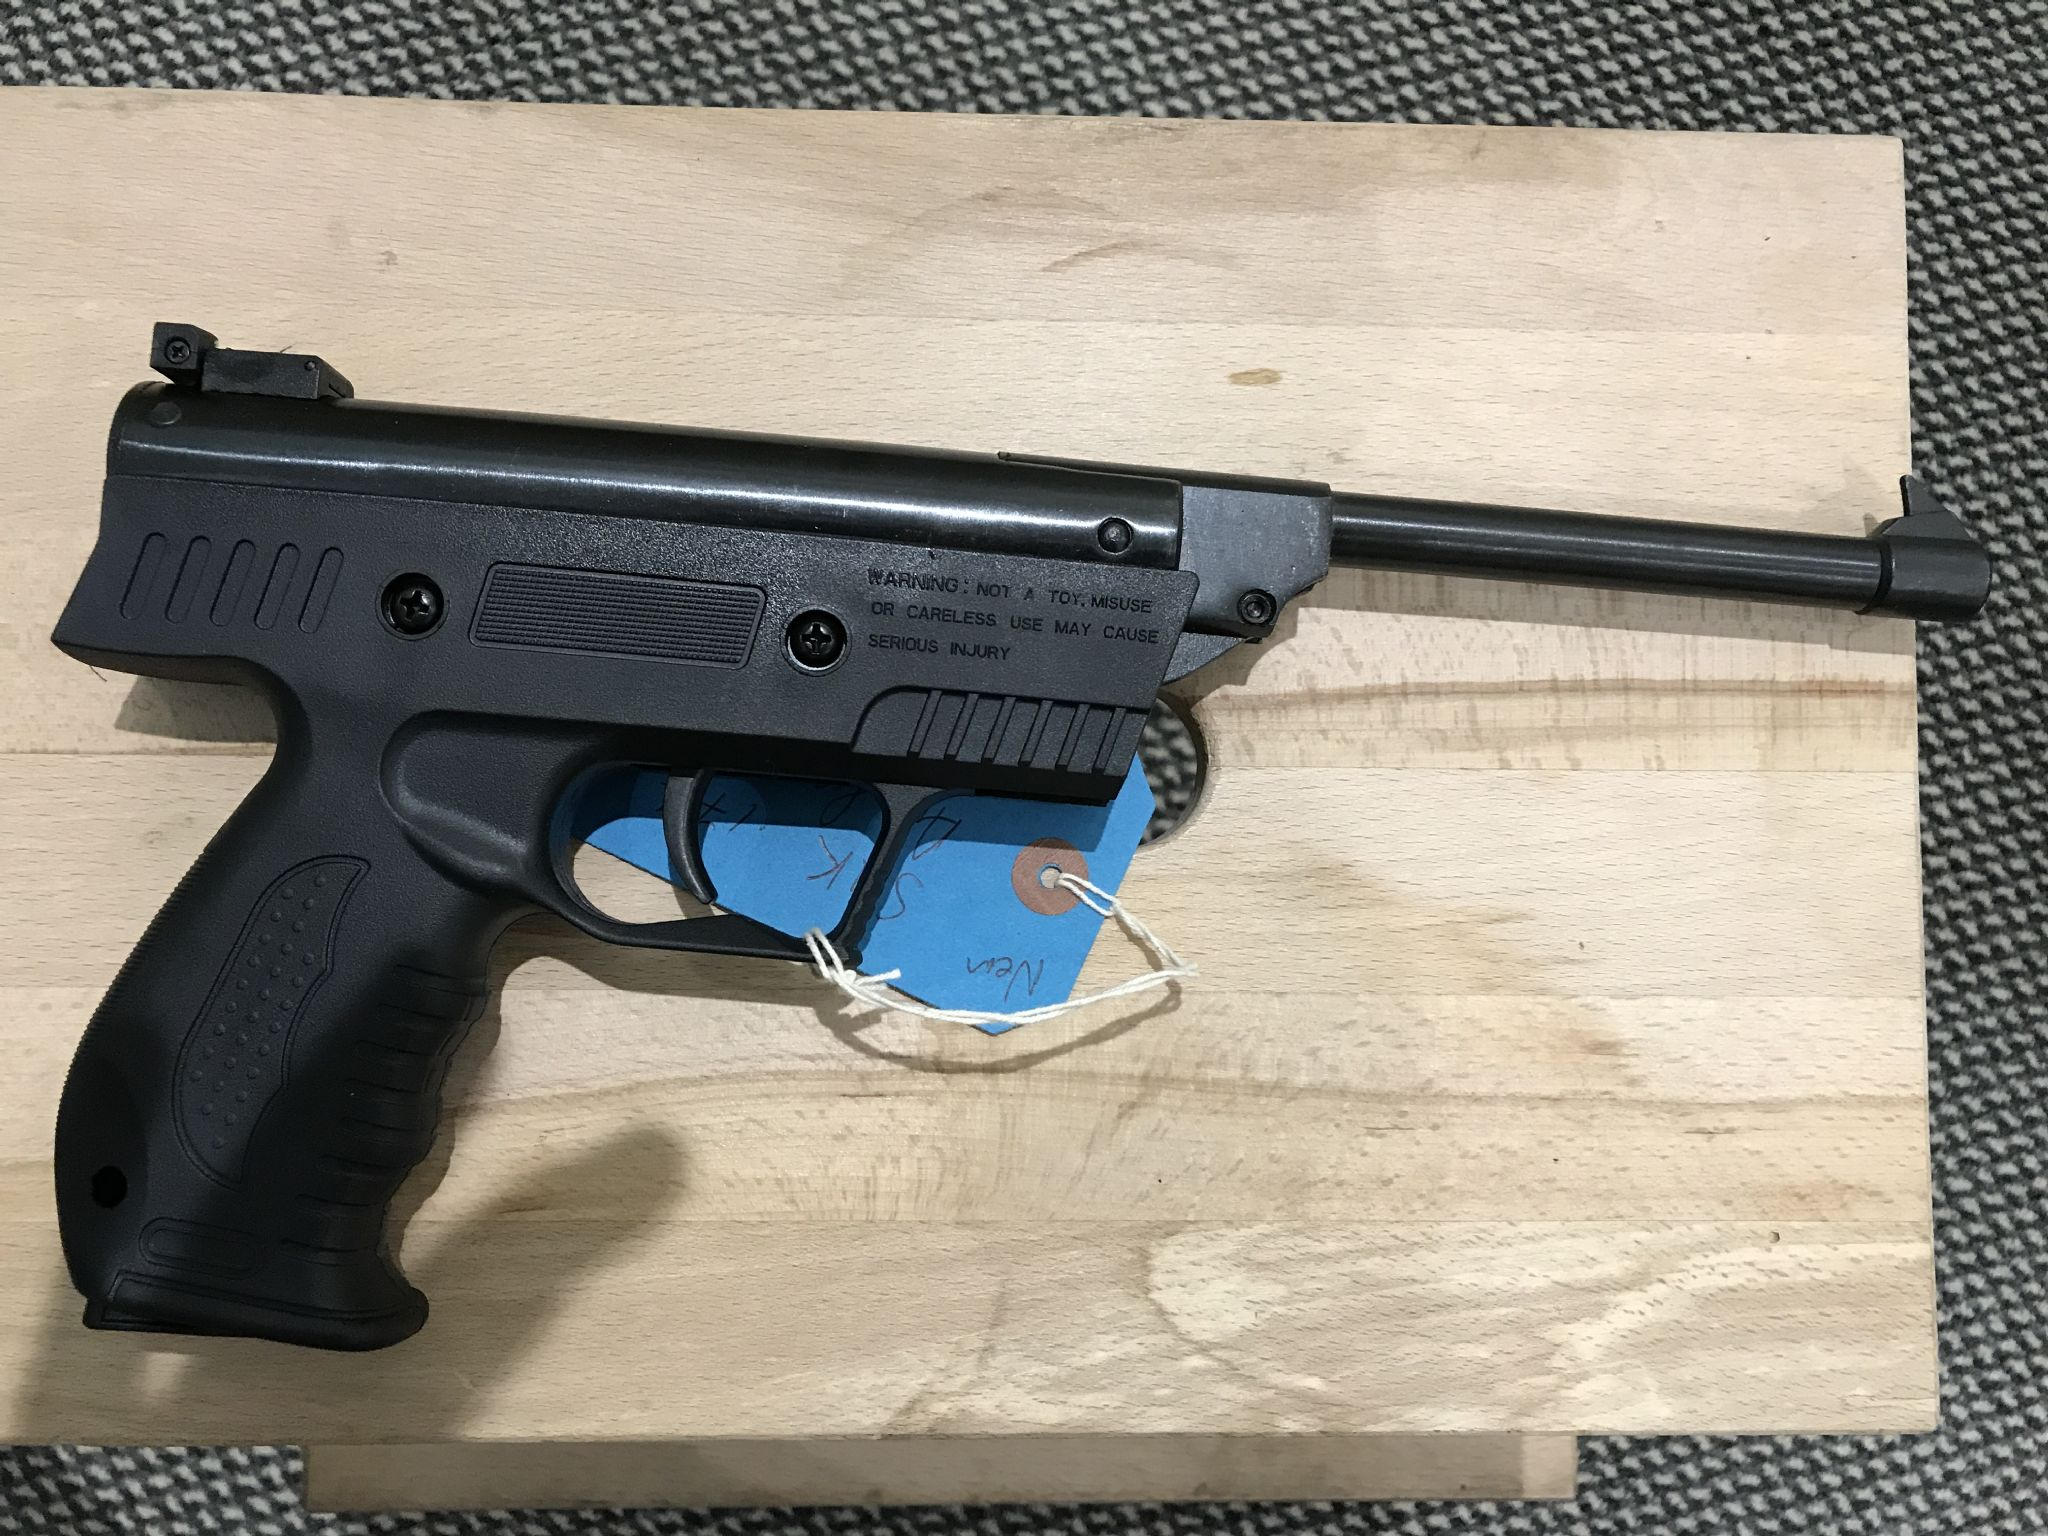 177 SMK XHS3 Break Barrel Air Pistol